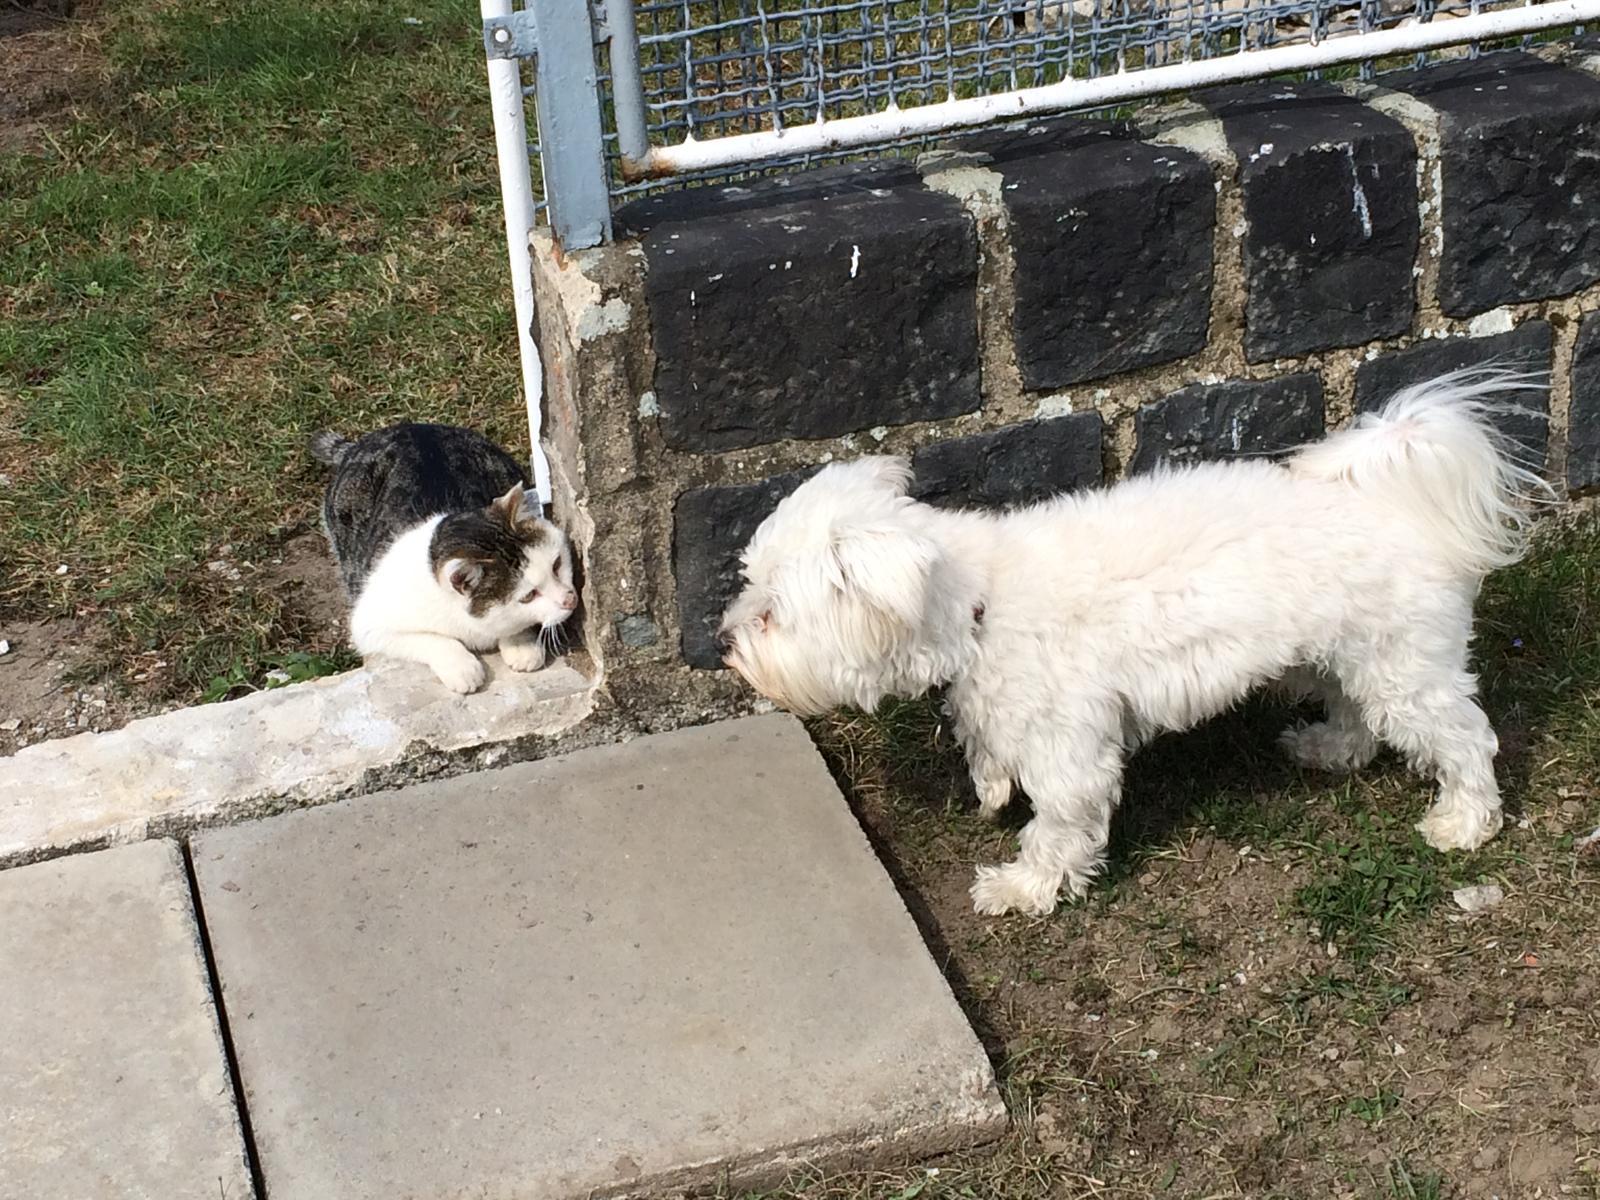 Dům i Zahrada 2019 - Švagrův kocour miluje  číhat a vyskakovat ze skrýší na našeho hafa.... tady nestíhá skočit, pes ho odhalil